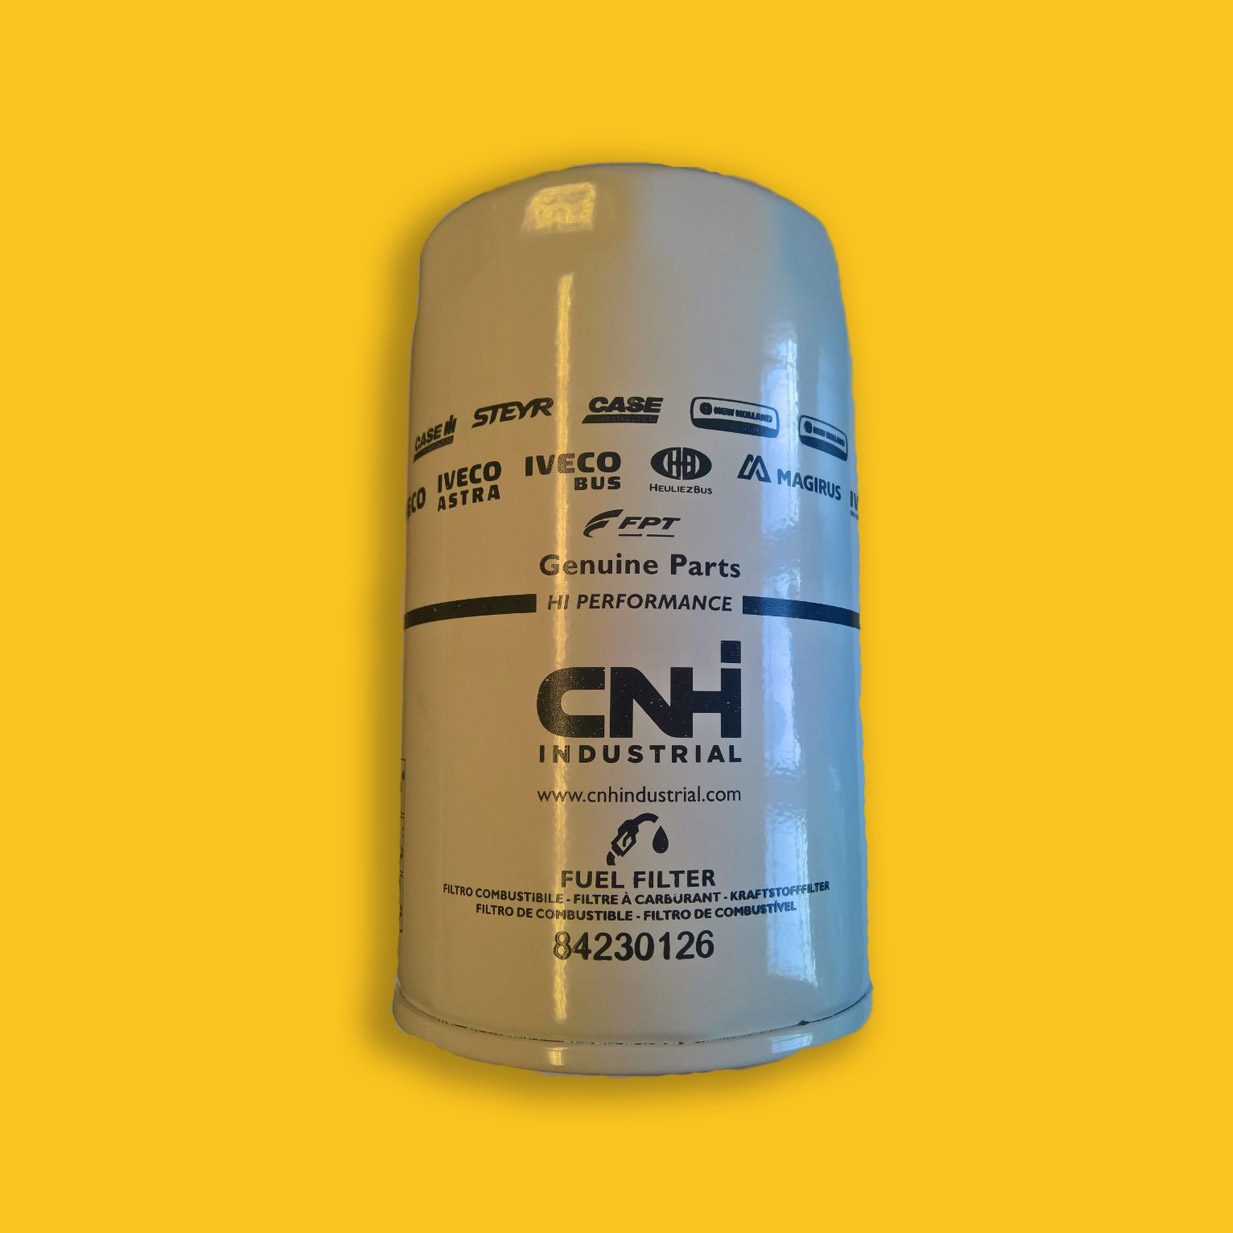 Filtro Carburante CNH - New Holland - 84230126